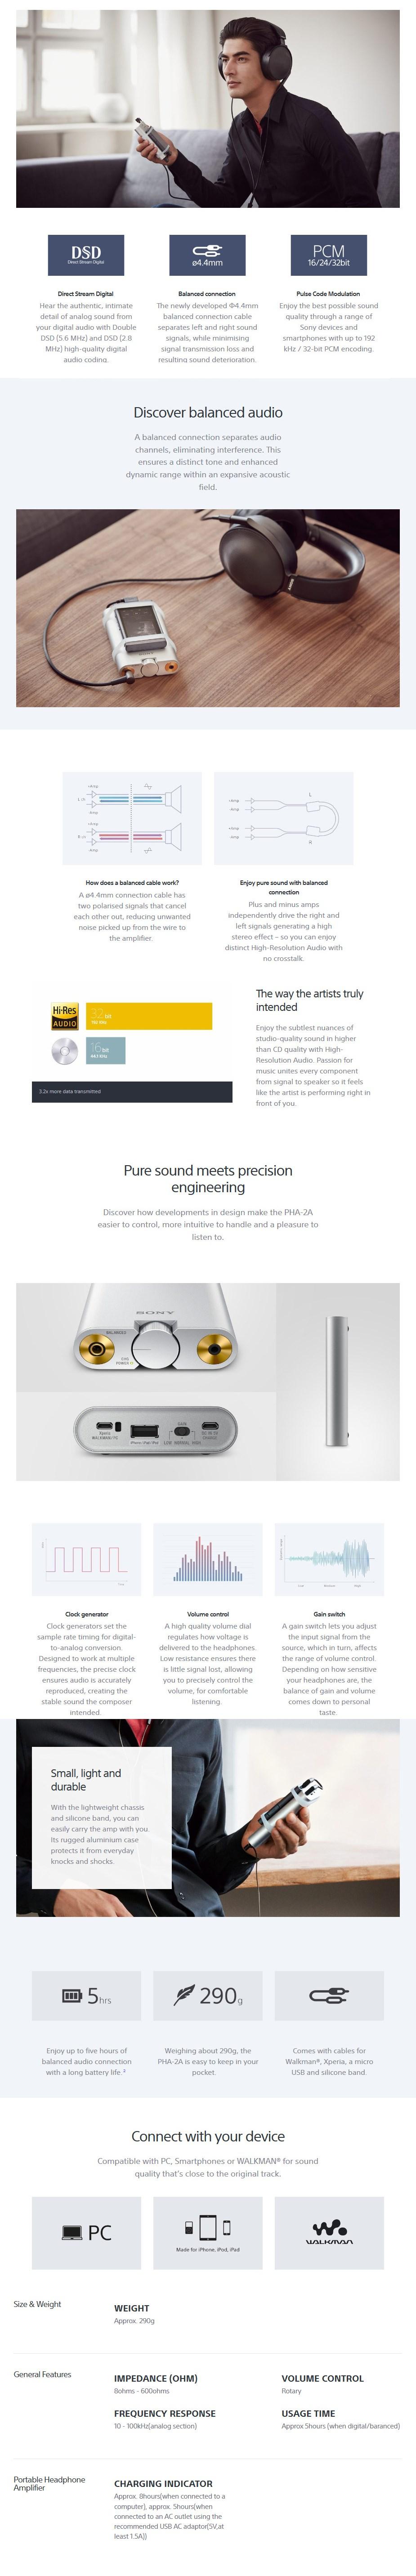 Sony PHA-2A USB DAC Headphone Amplifier - Desktop Overview 1